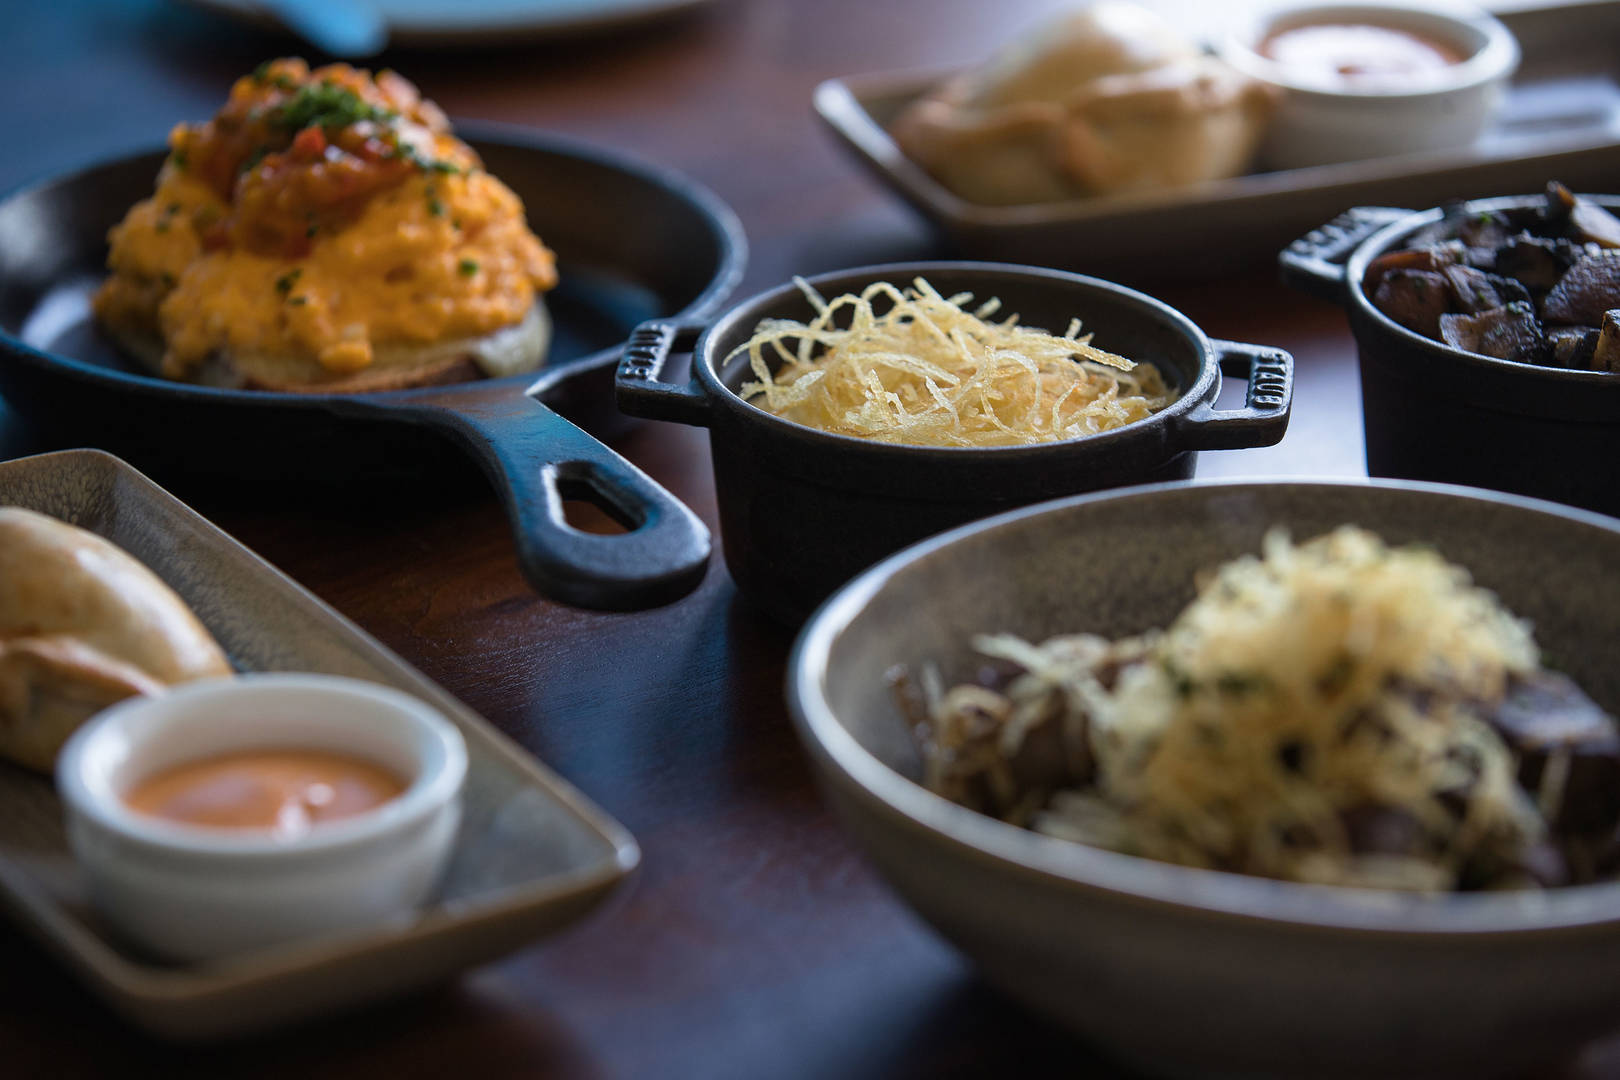 Dish in La Parrilla at Jumeirah Beach Hotel